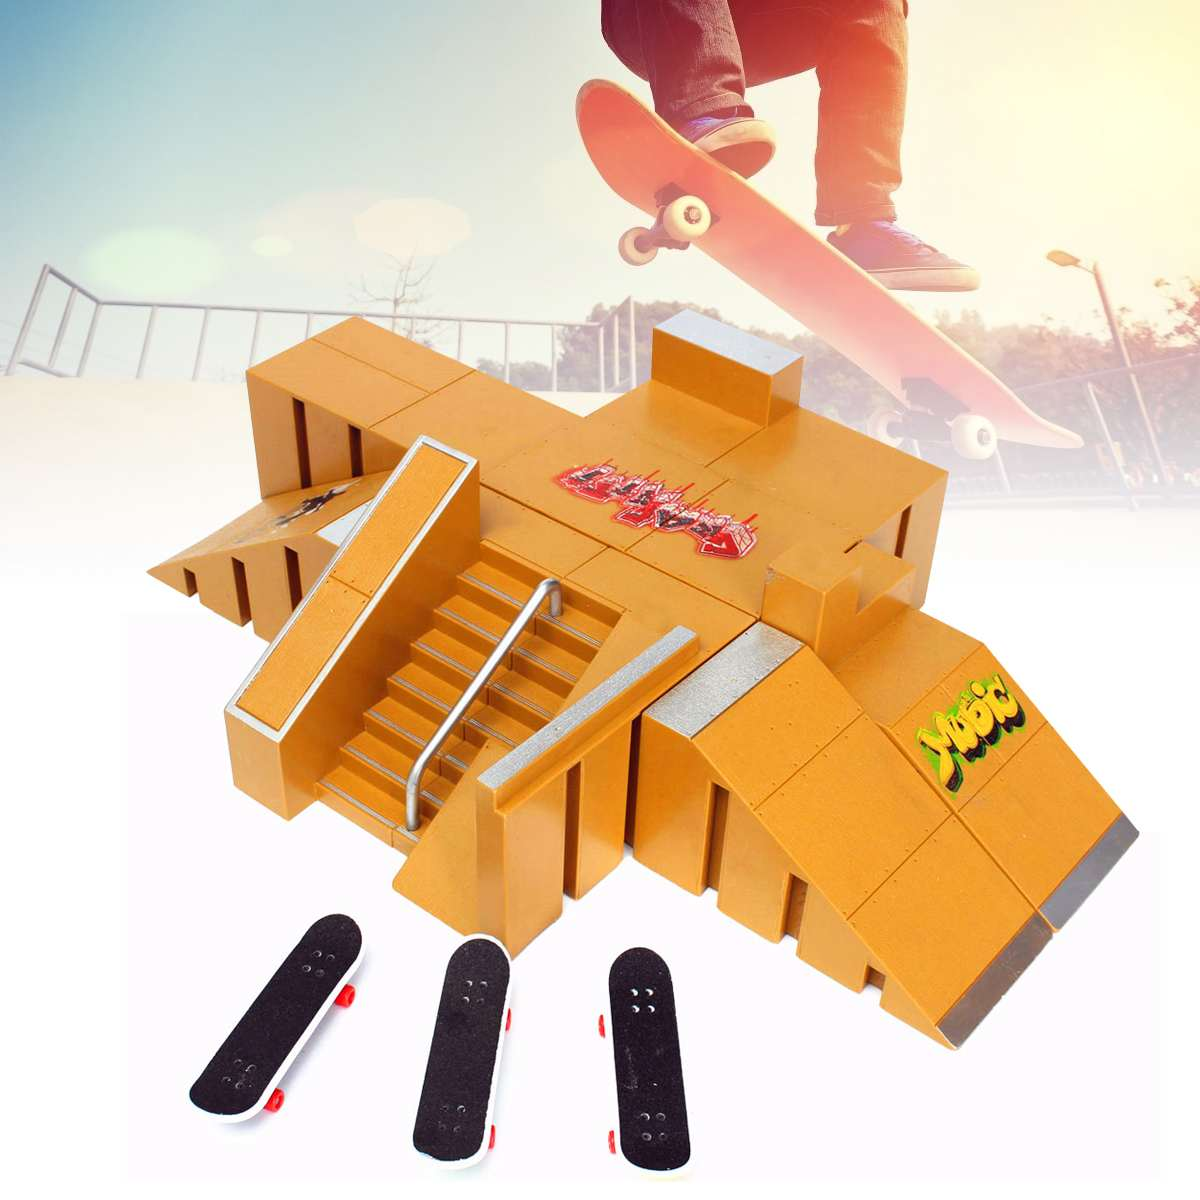 26Pcs Skate Park Kit Ramp Parts For Tech Deck Fingerboard Mini Finger Skateboard Ultimate Parks 92A Funny Game Toys Kids Gifts